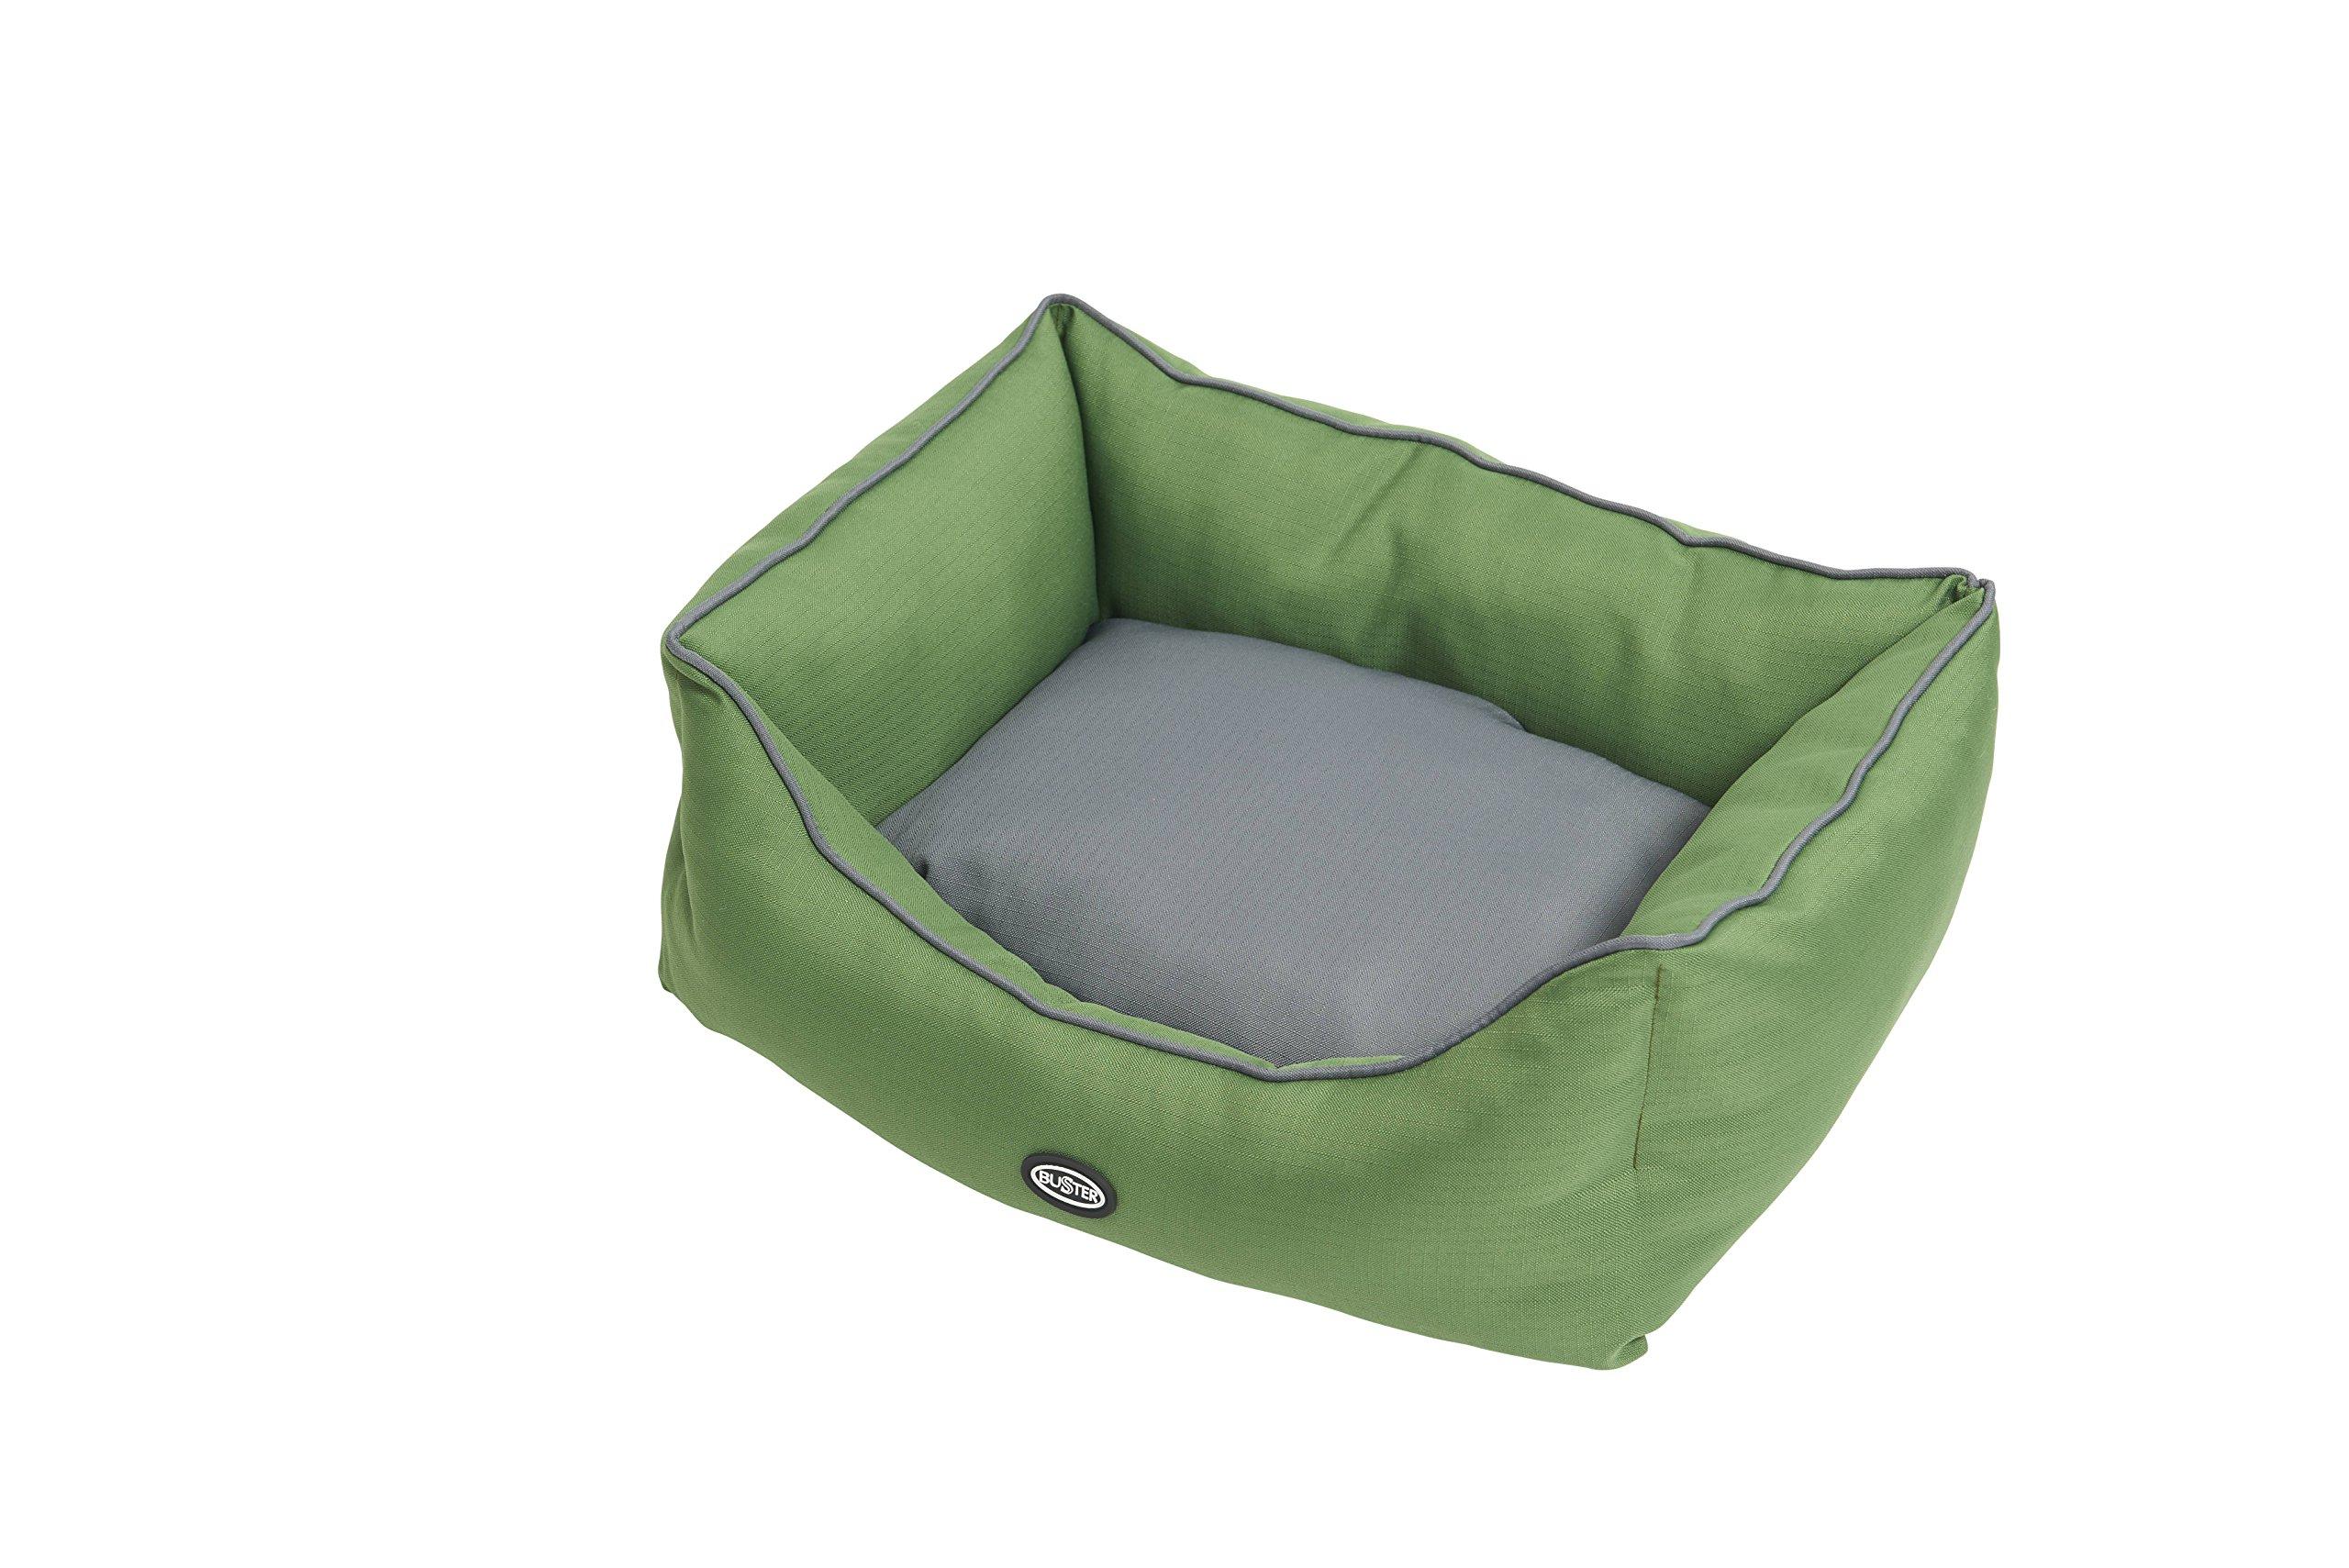 Kruuse Buster Sofa Bed, Artichoke Green/Steel Grey, 45 x 24